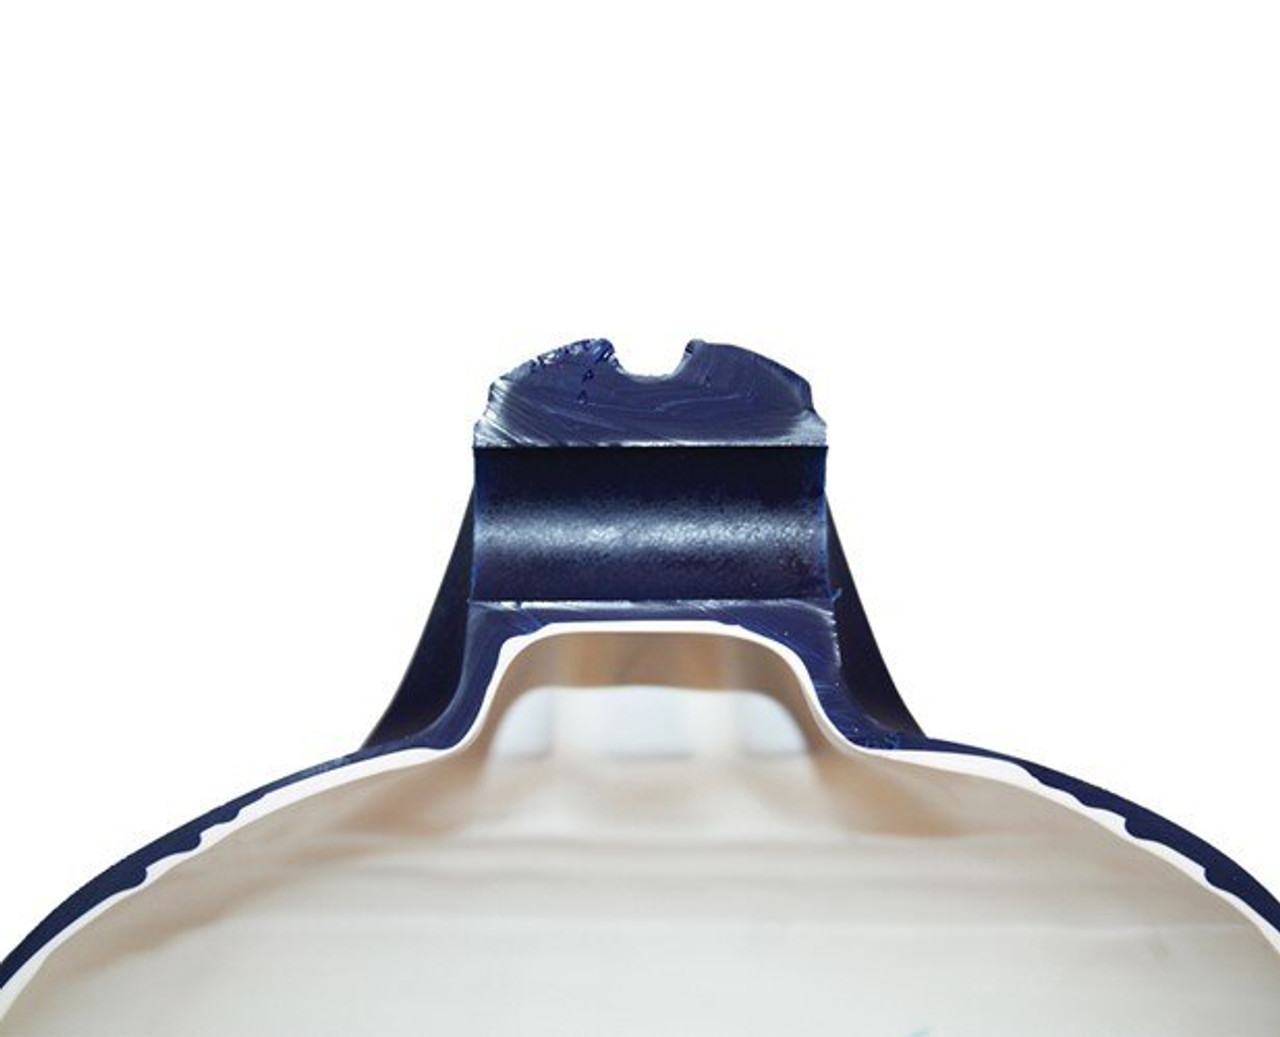 RWB Ocean Heavy Duty Fender - inner crosscut detail